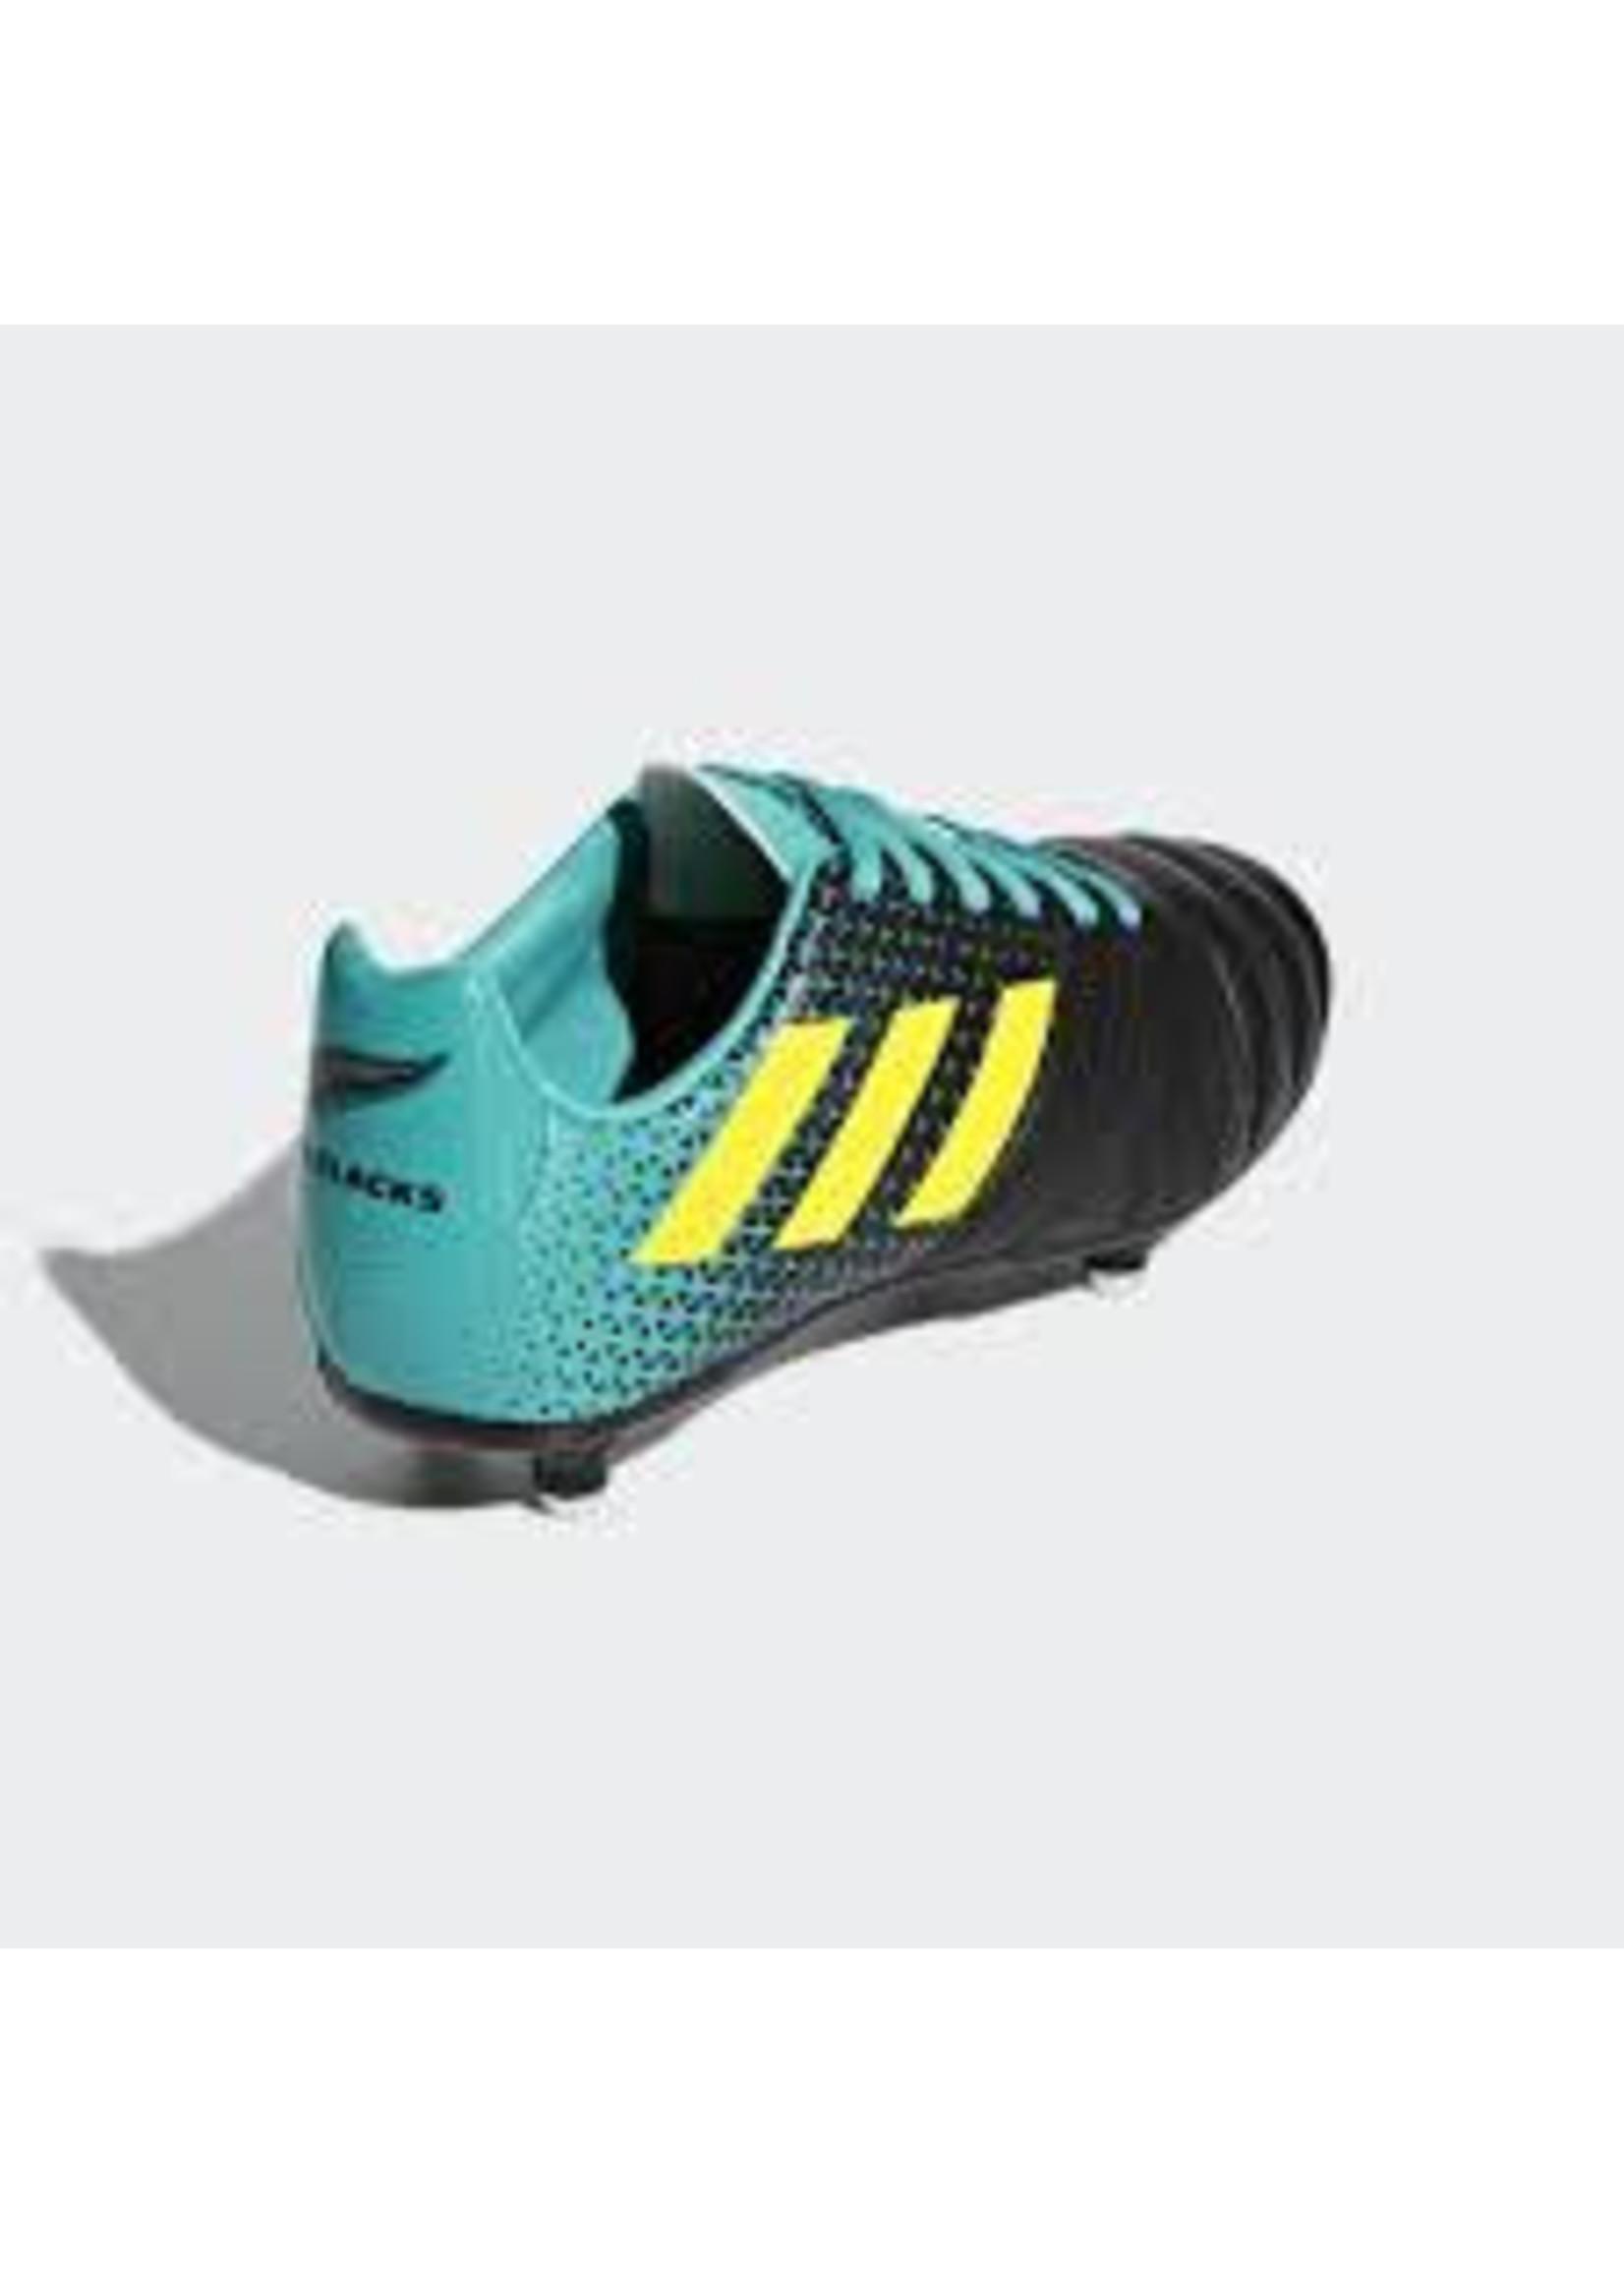 Adidas Adidas All Blacks Junior Rugby Boots (2018)